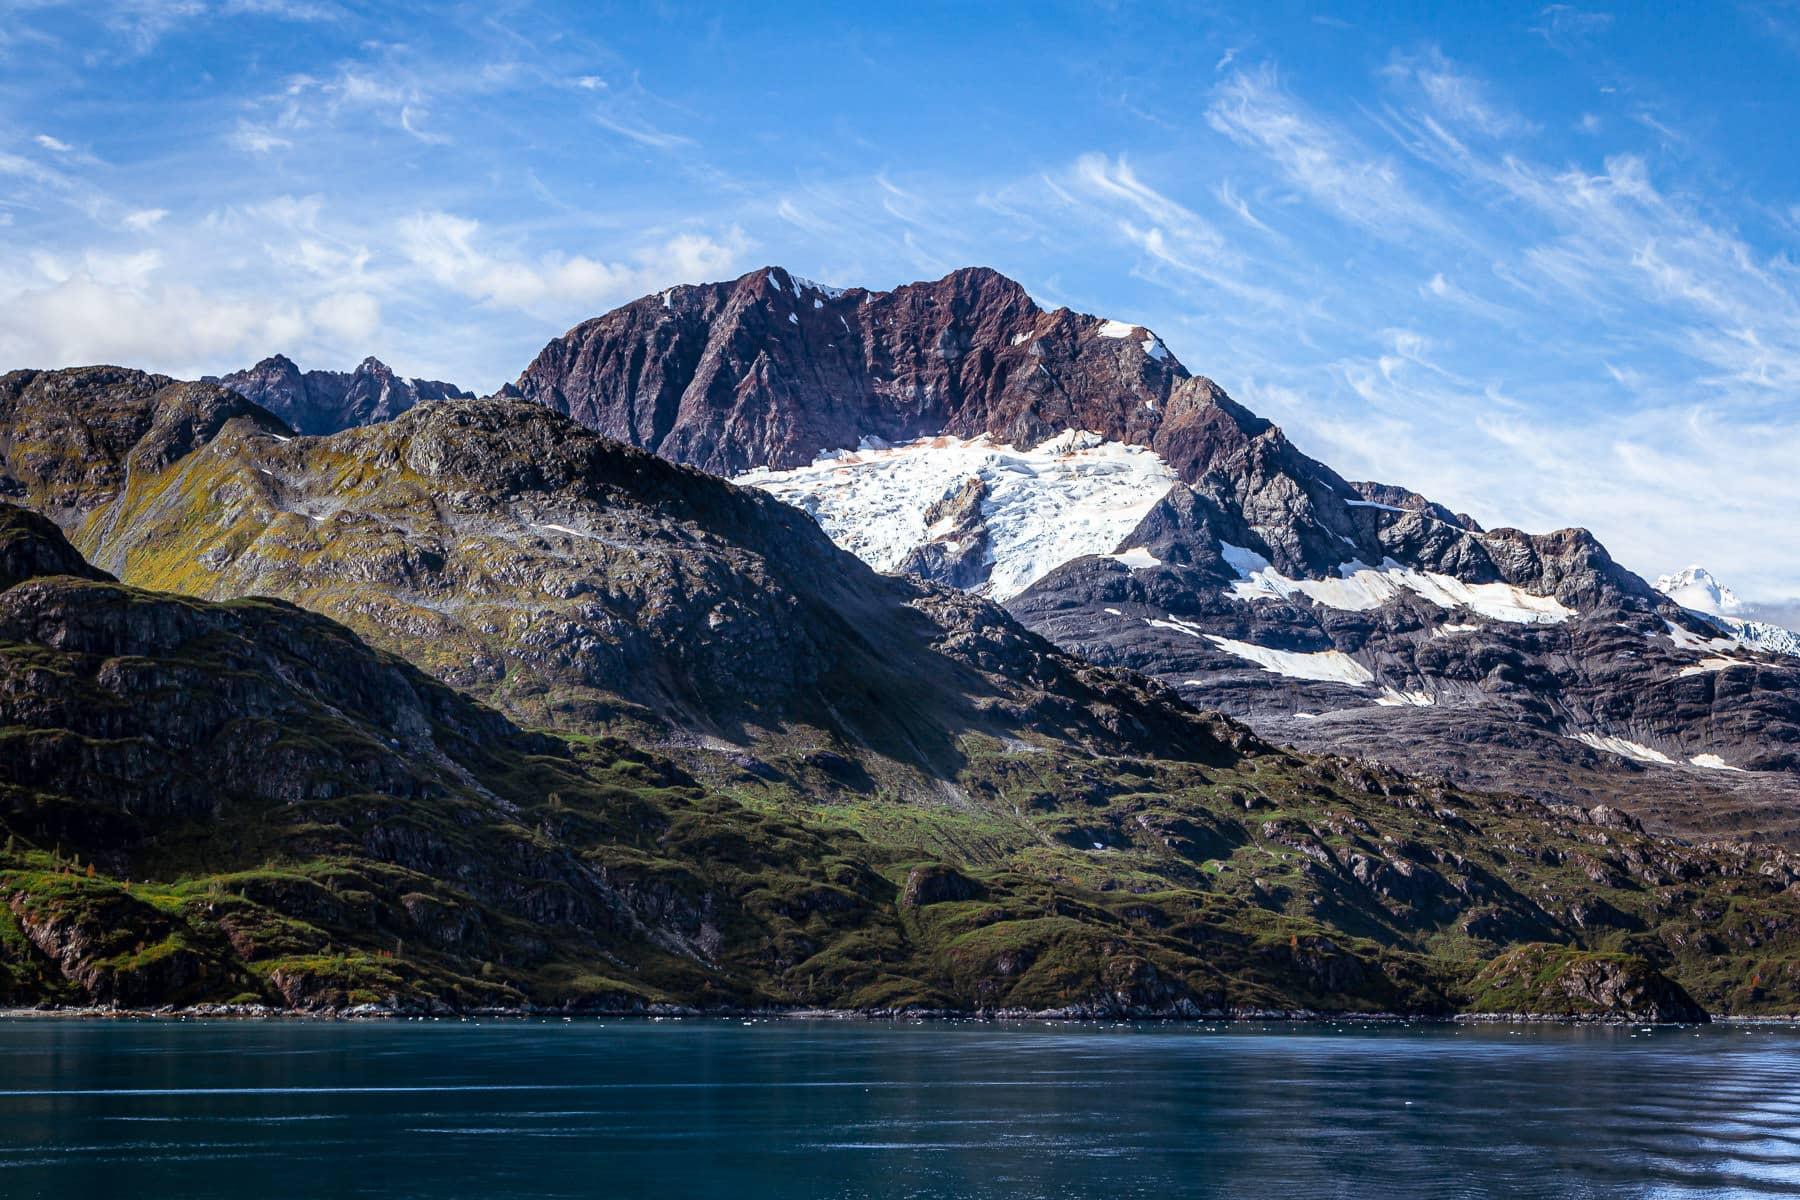 A glacier on the side of a mountainous ridge at Alaska's Glacier Bay National Park.